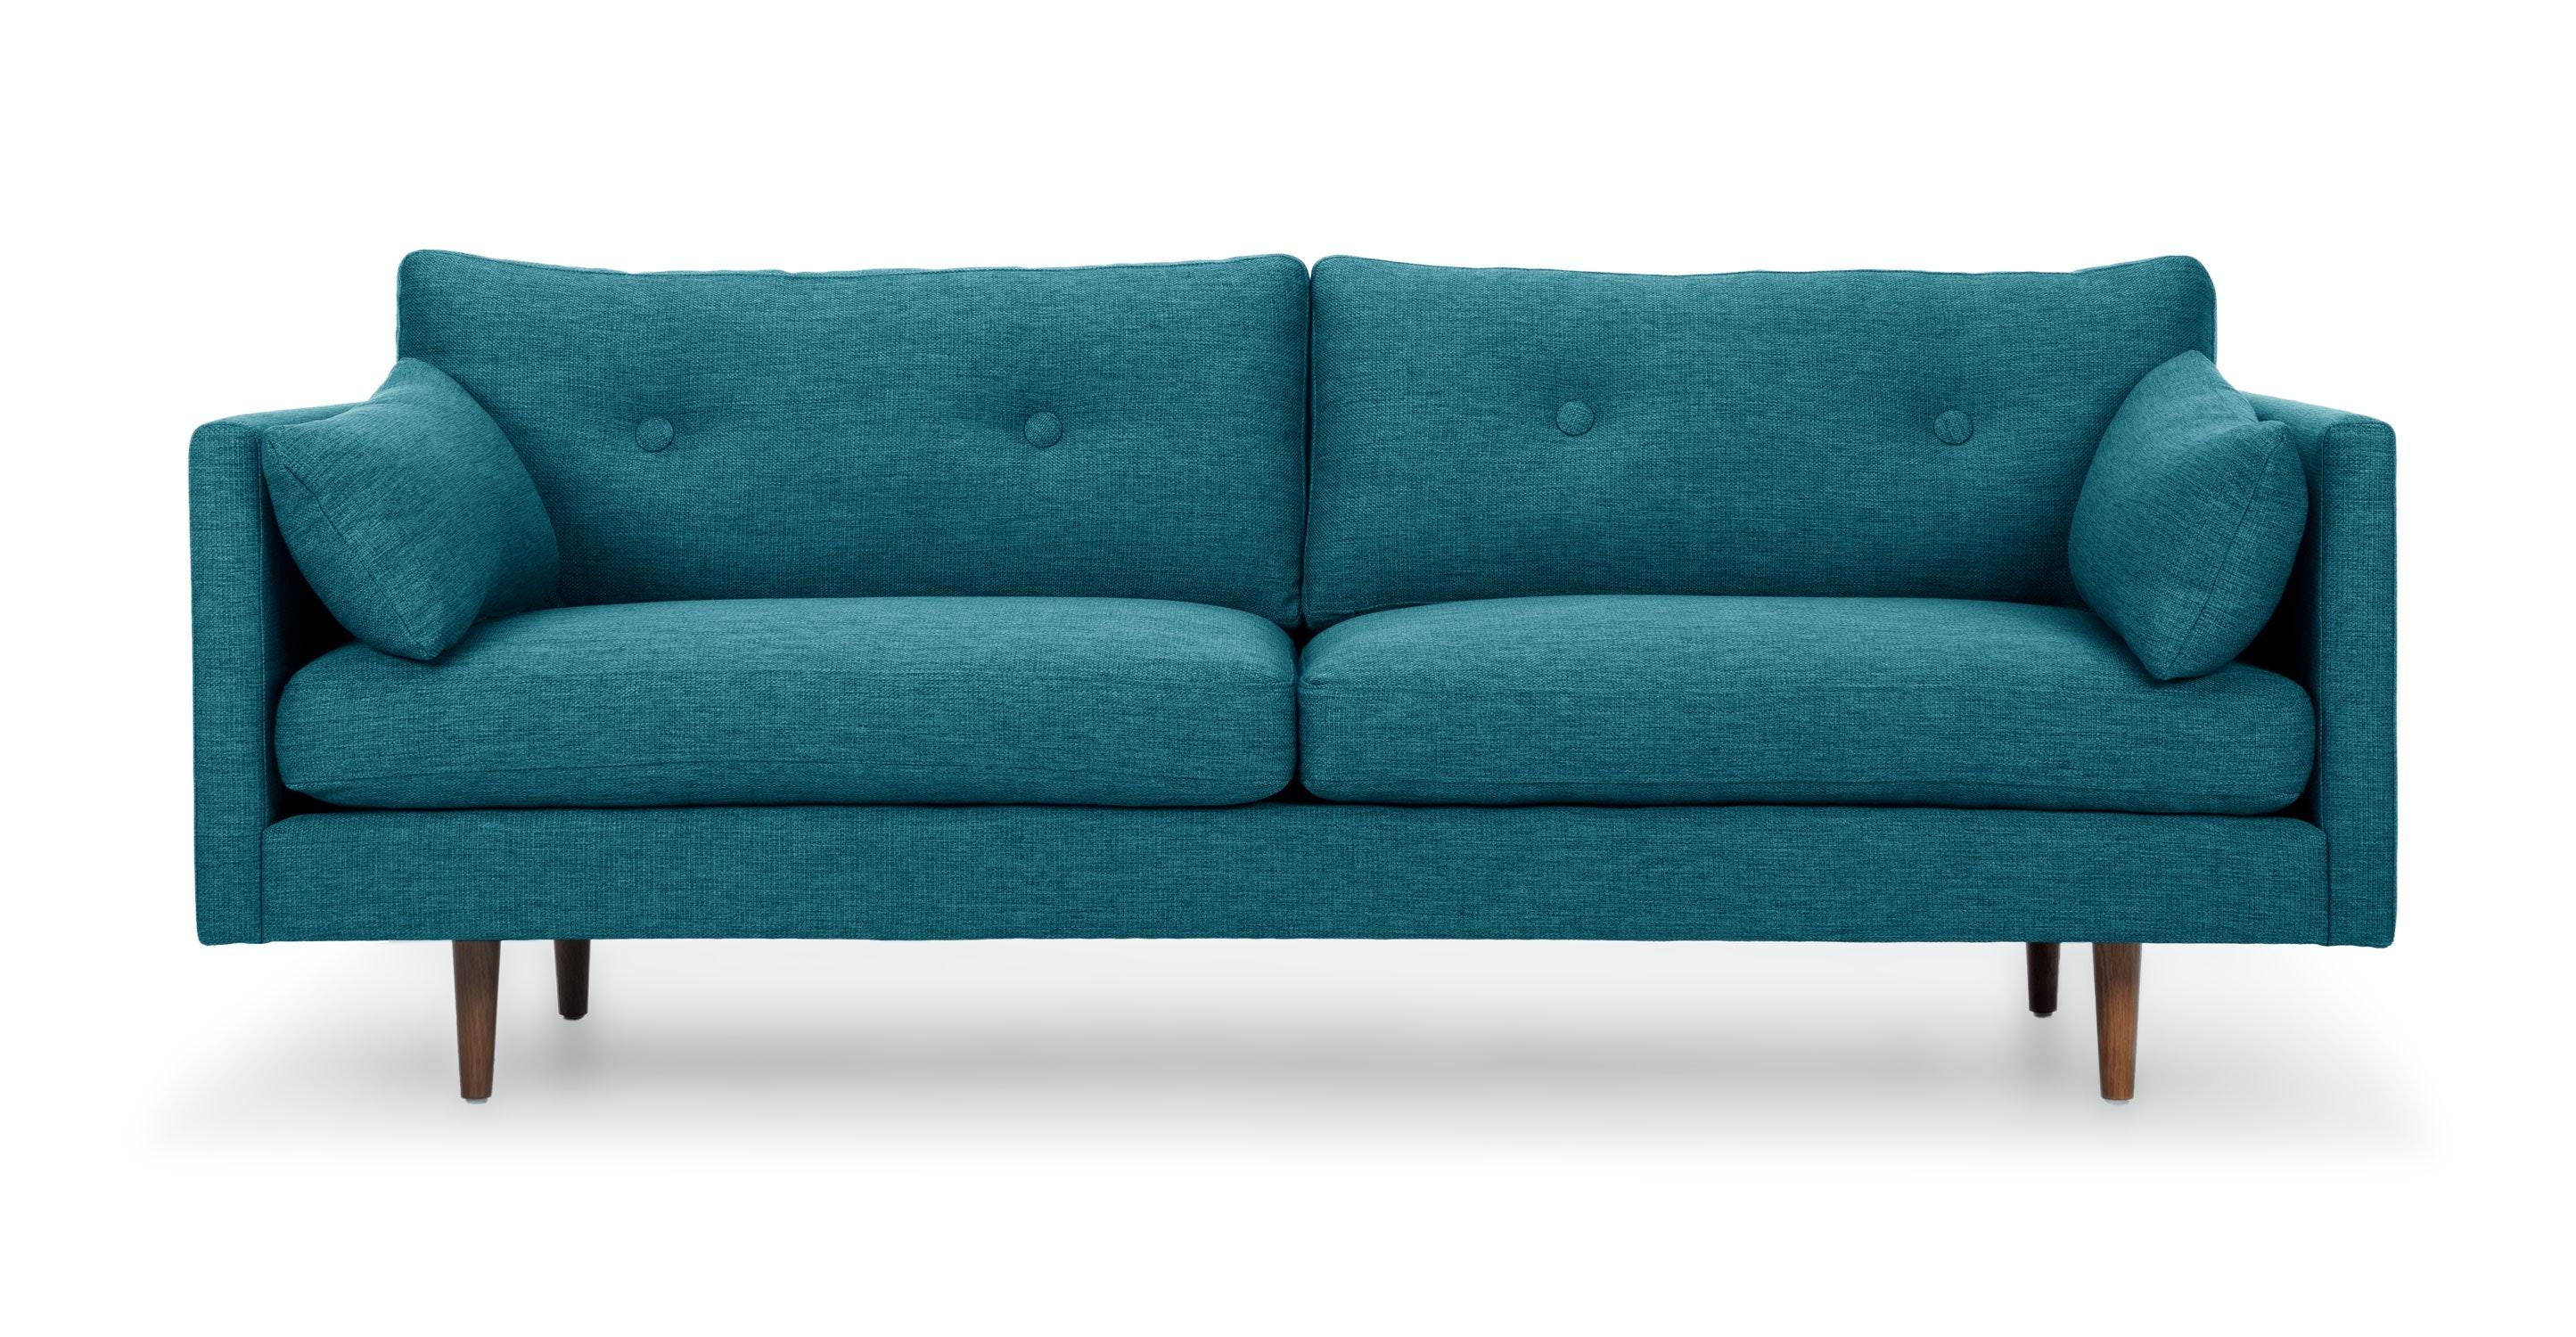 Anton Arizona Turquoise Sofa   Sofas   Article | Modern, Mid Century And  Scandinavian Furniture